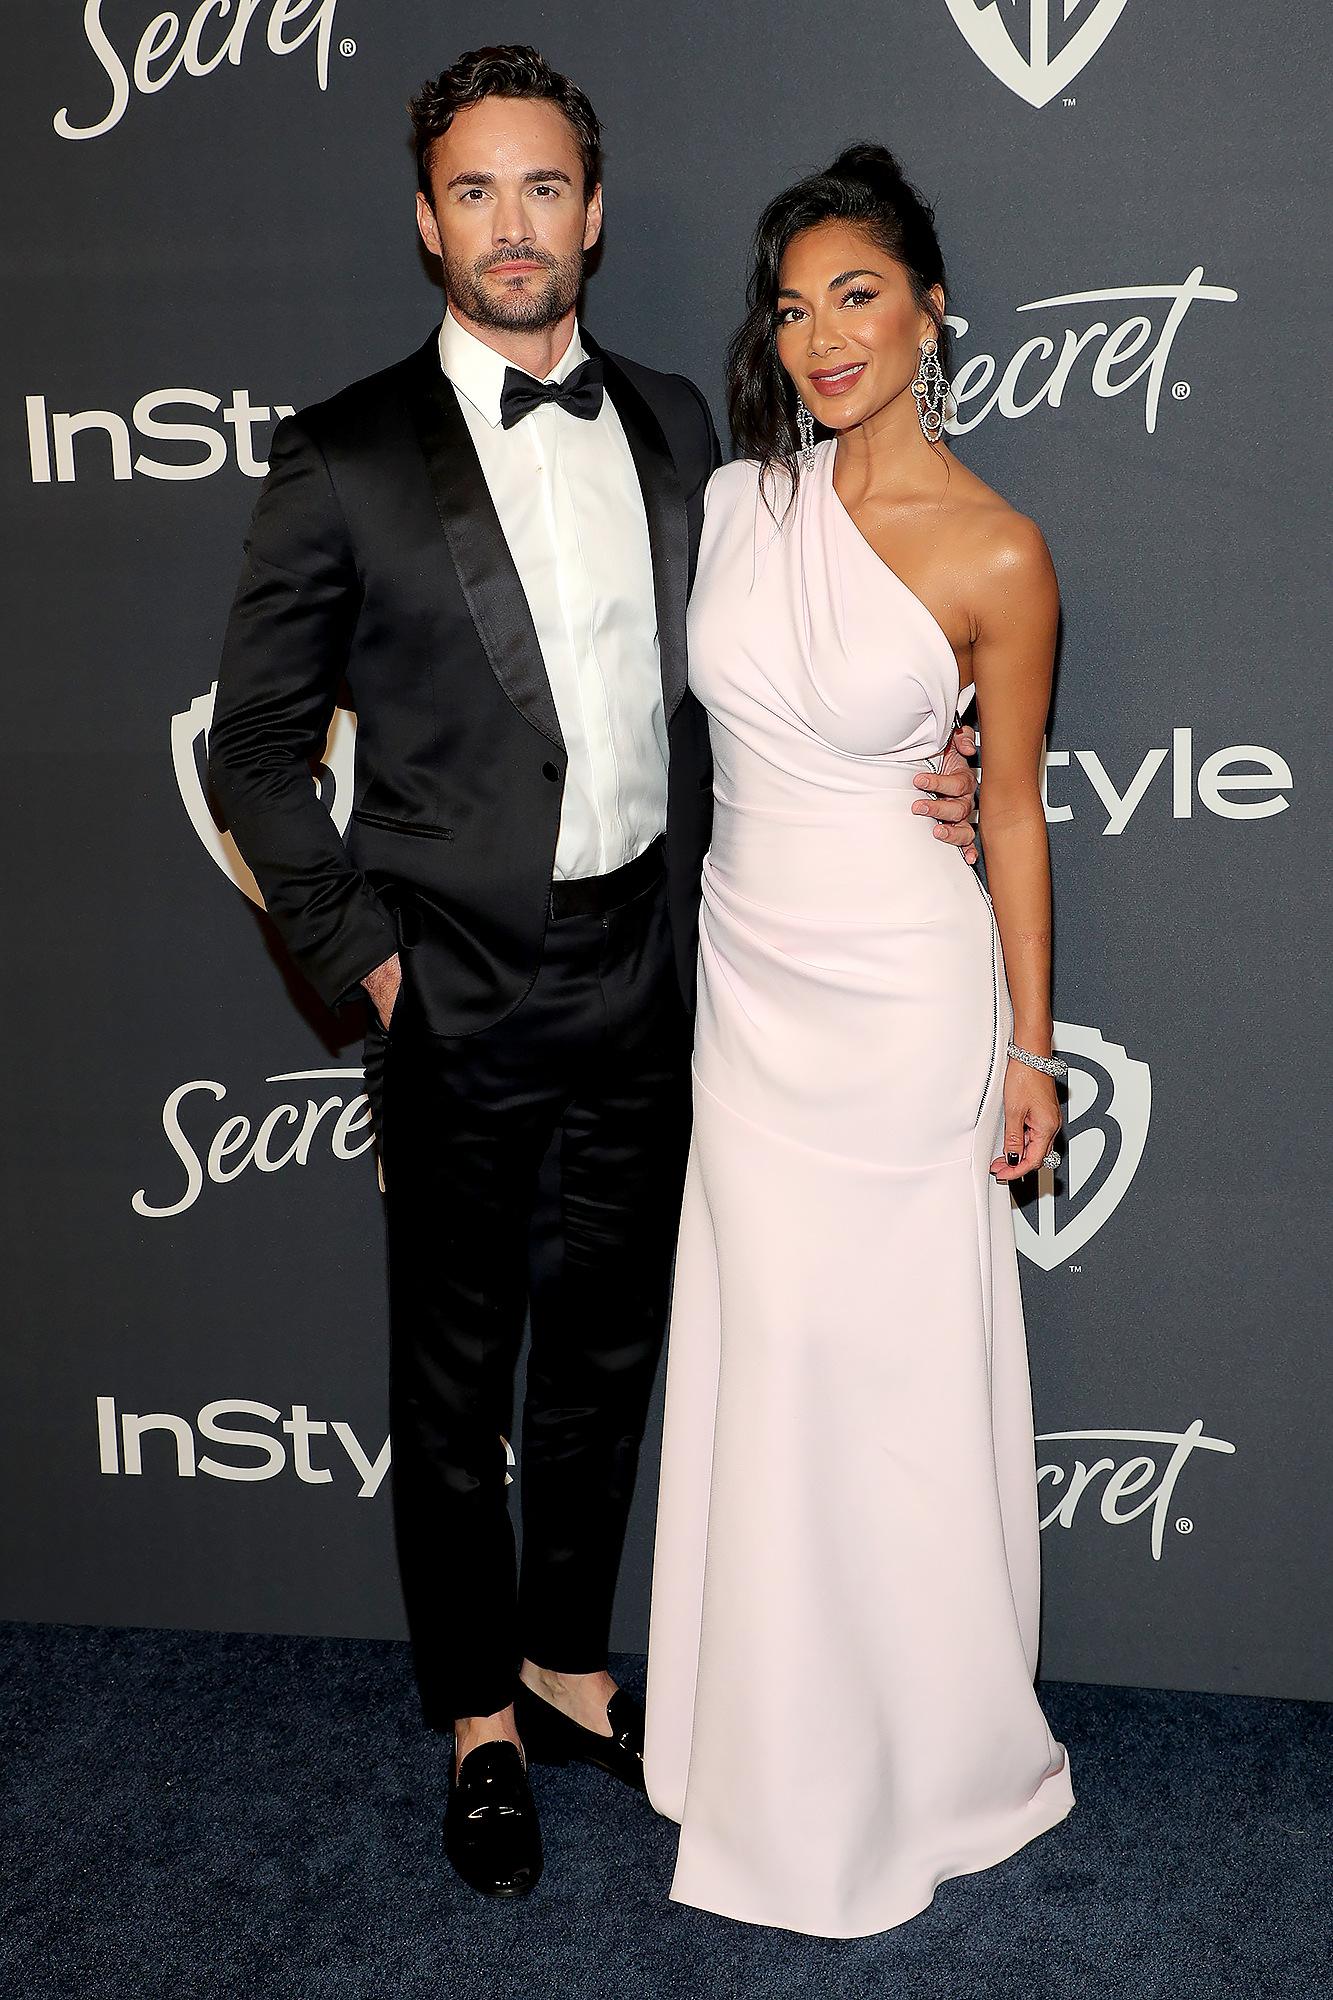 Nicole Scherzinger Makes Red Carpet Debut With 'X Factor UK' Contestant Thom Evans